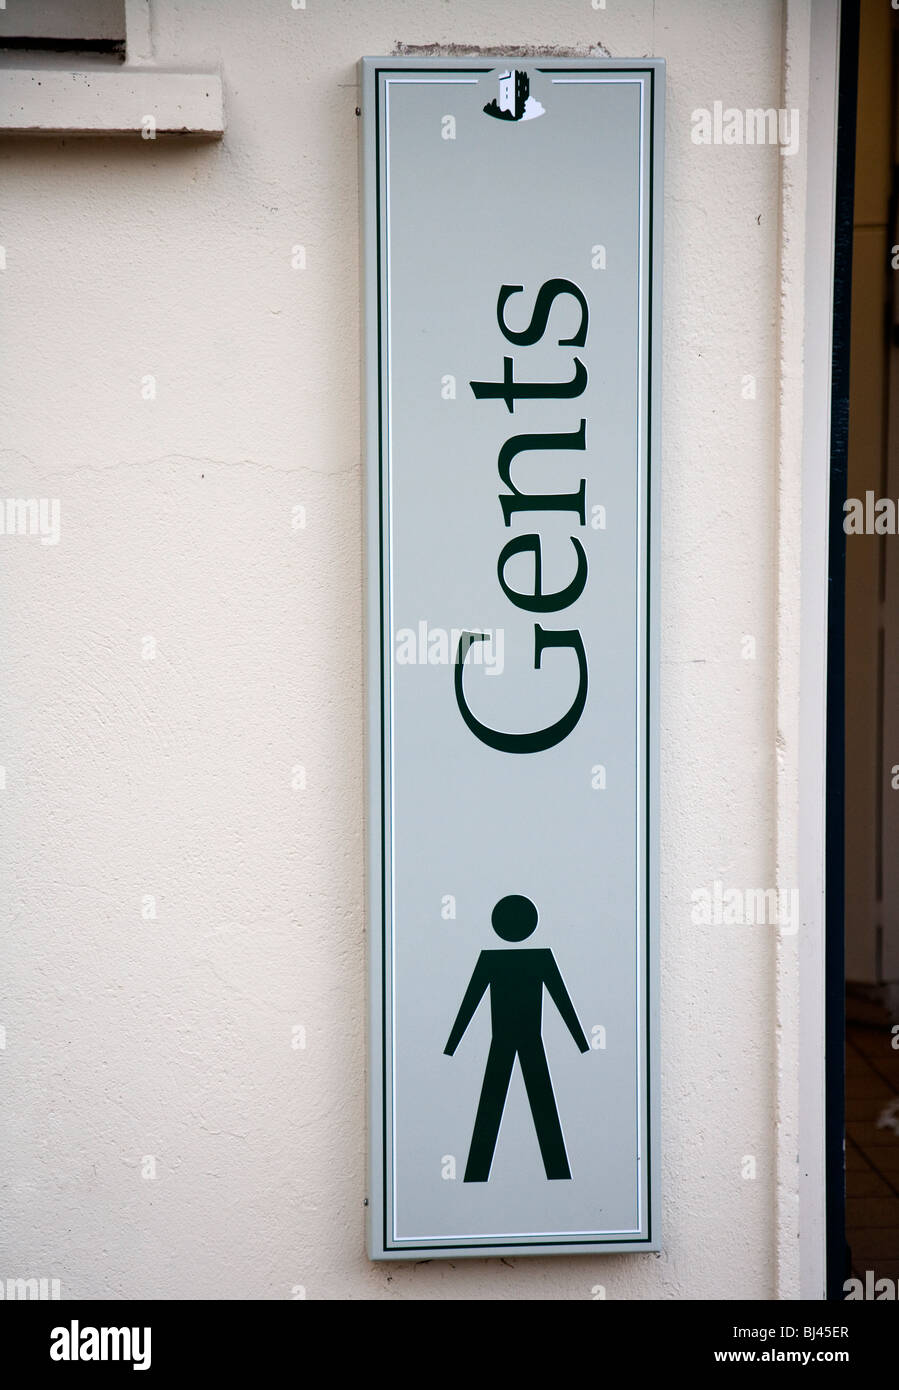 Gents Toilet Symbol Stock Photos Amp Gents Toilet Symbol